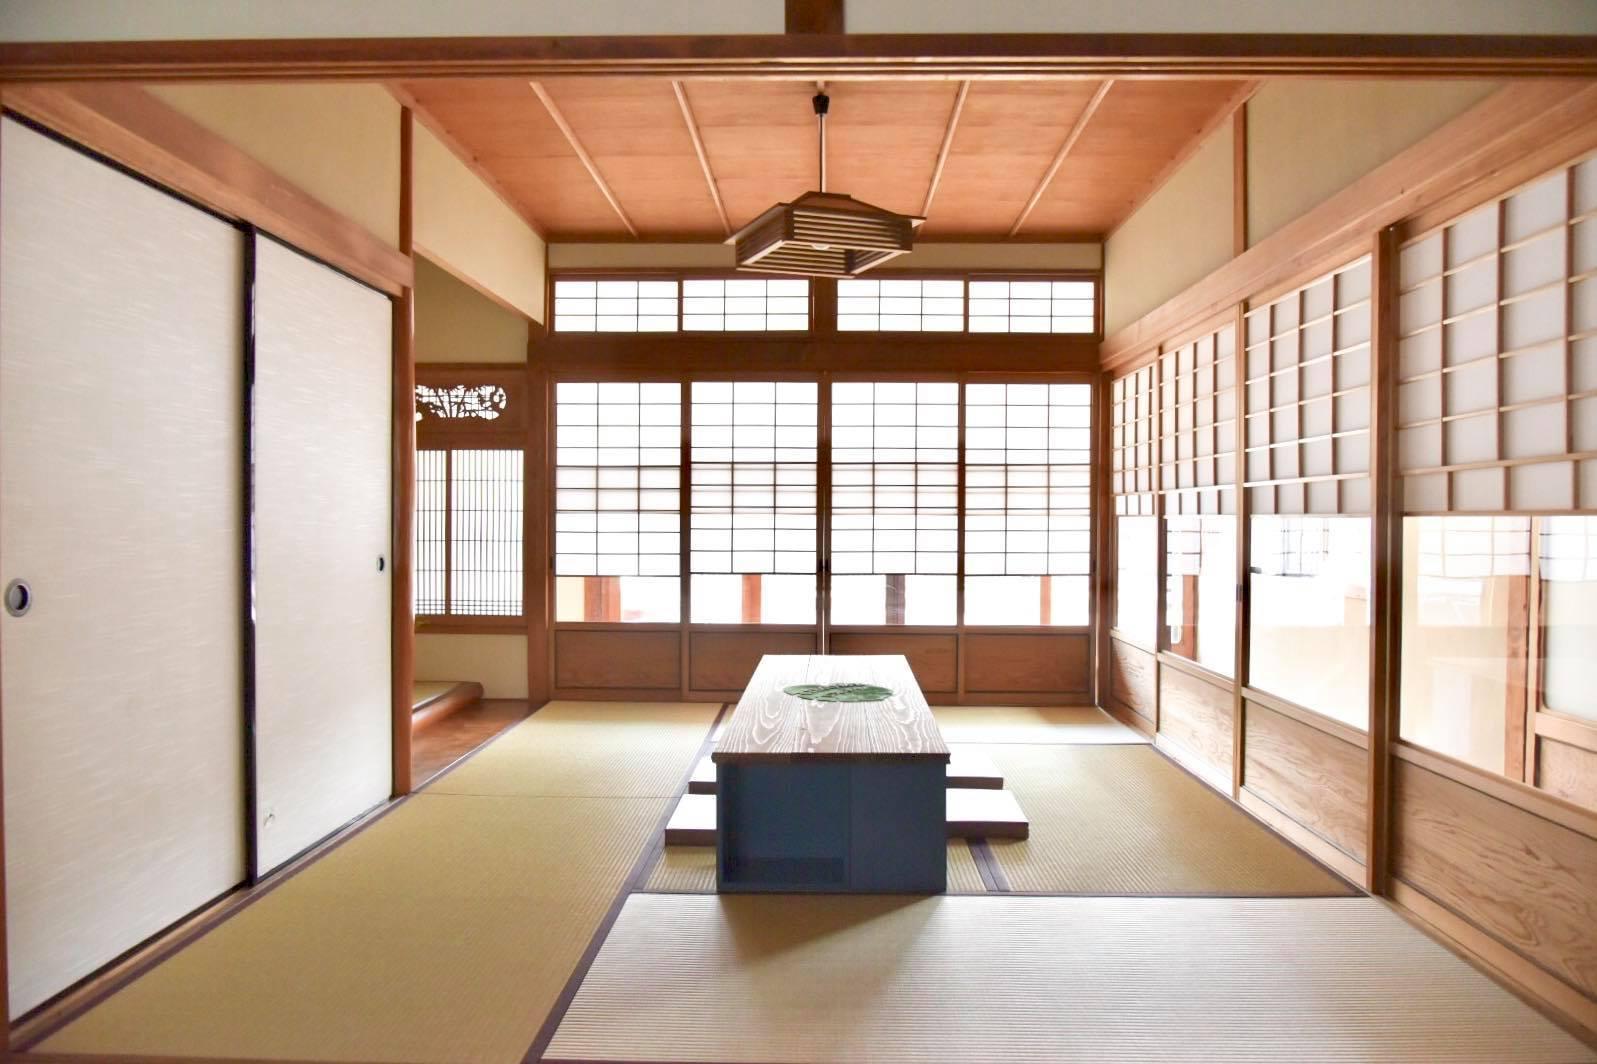 Luana ベース 和室 多目的スペースの室内の写真